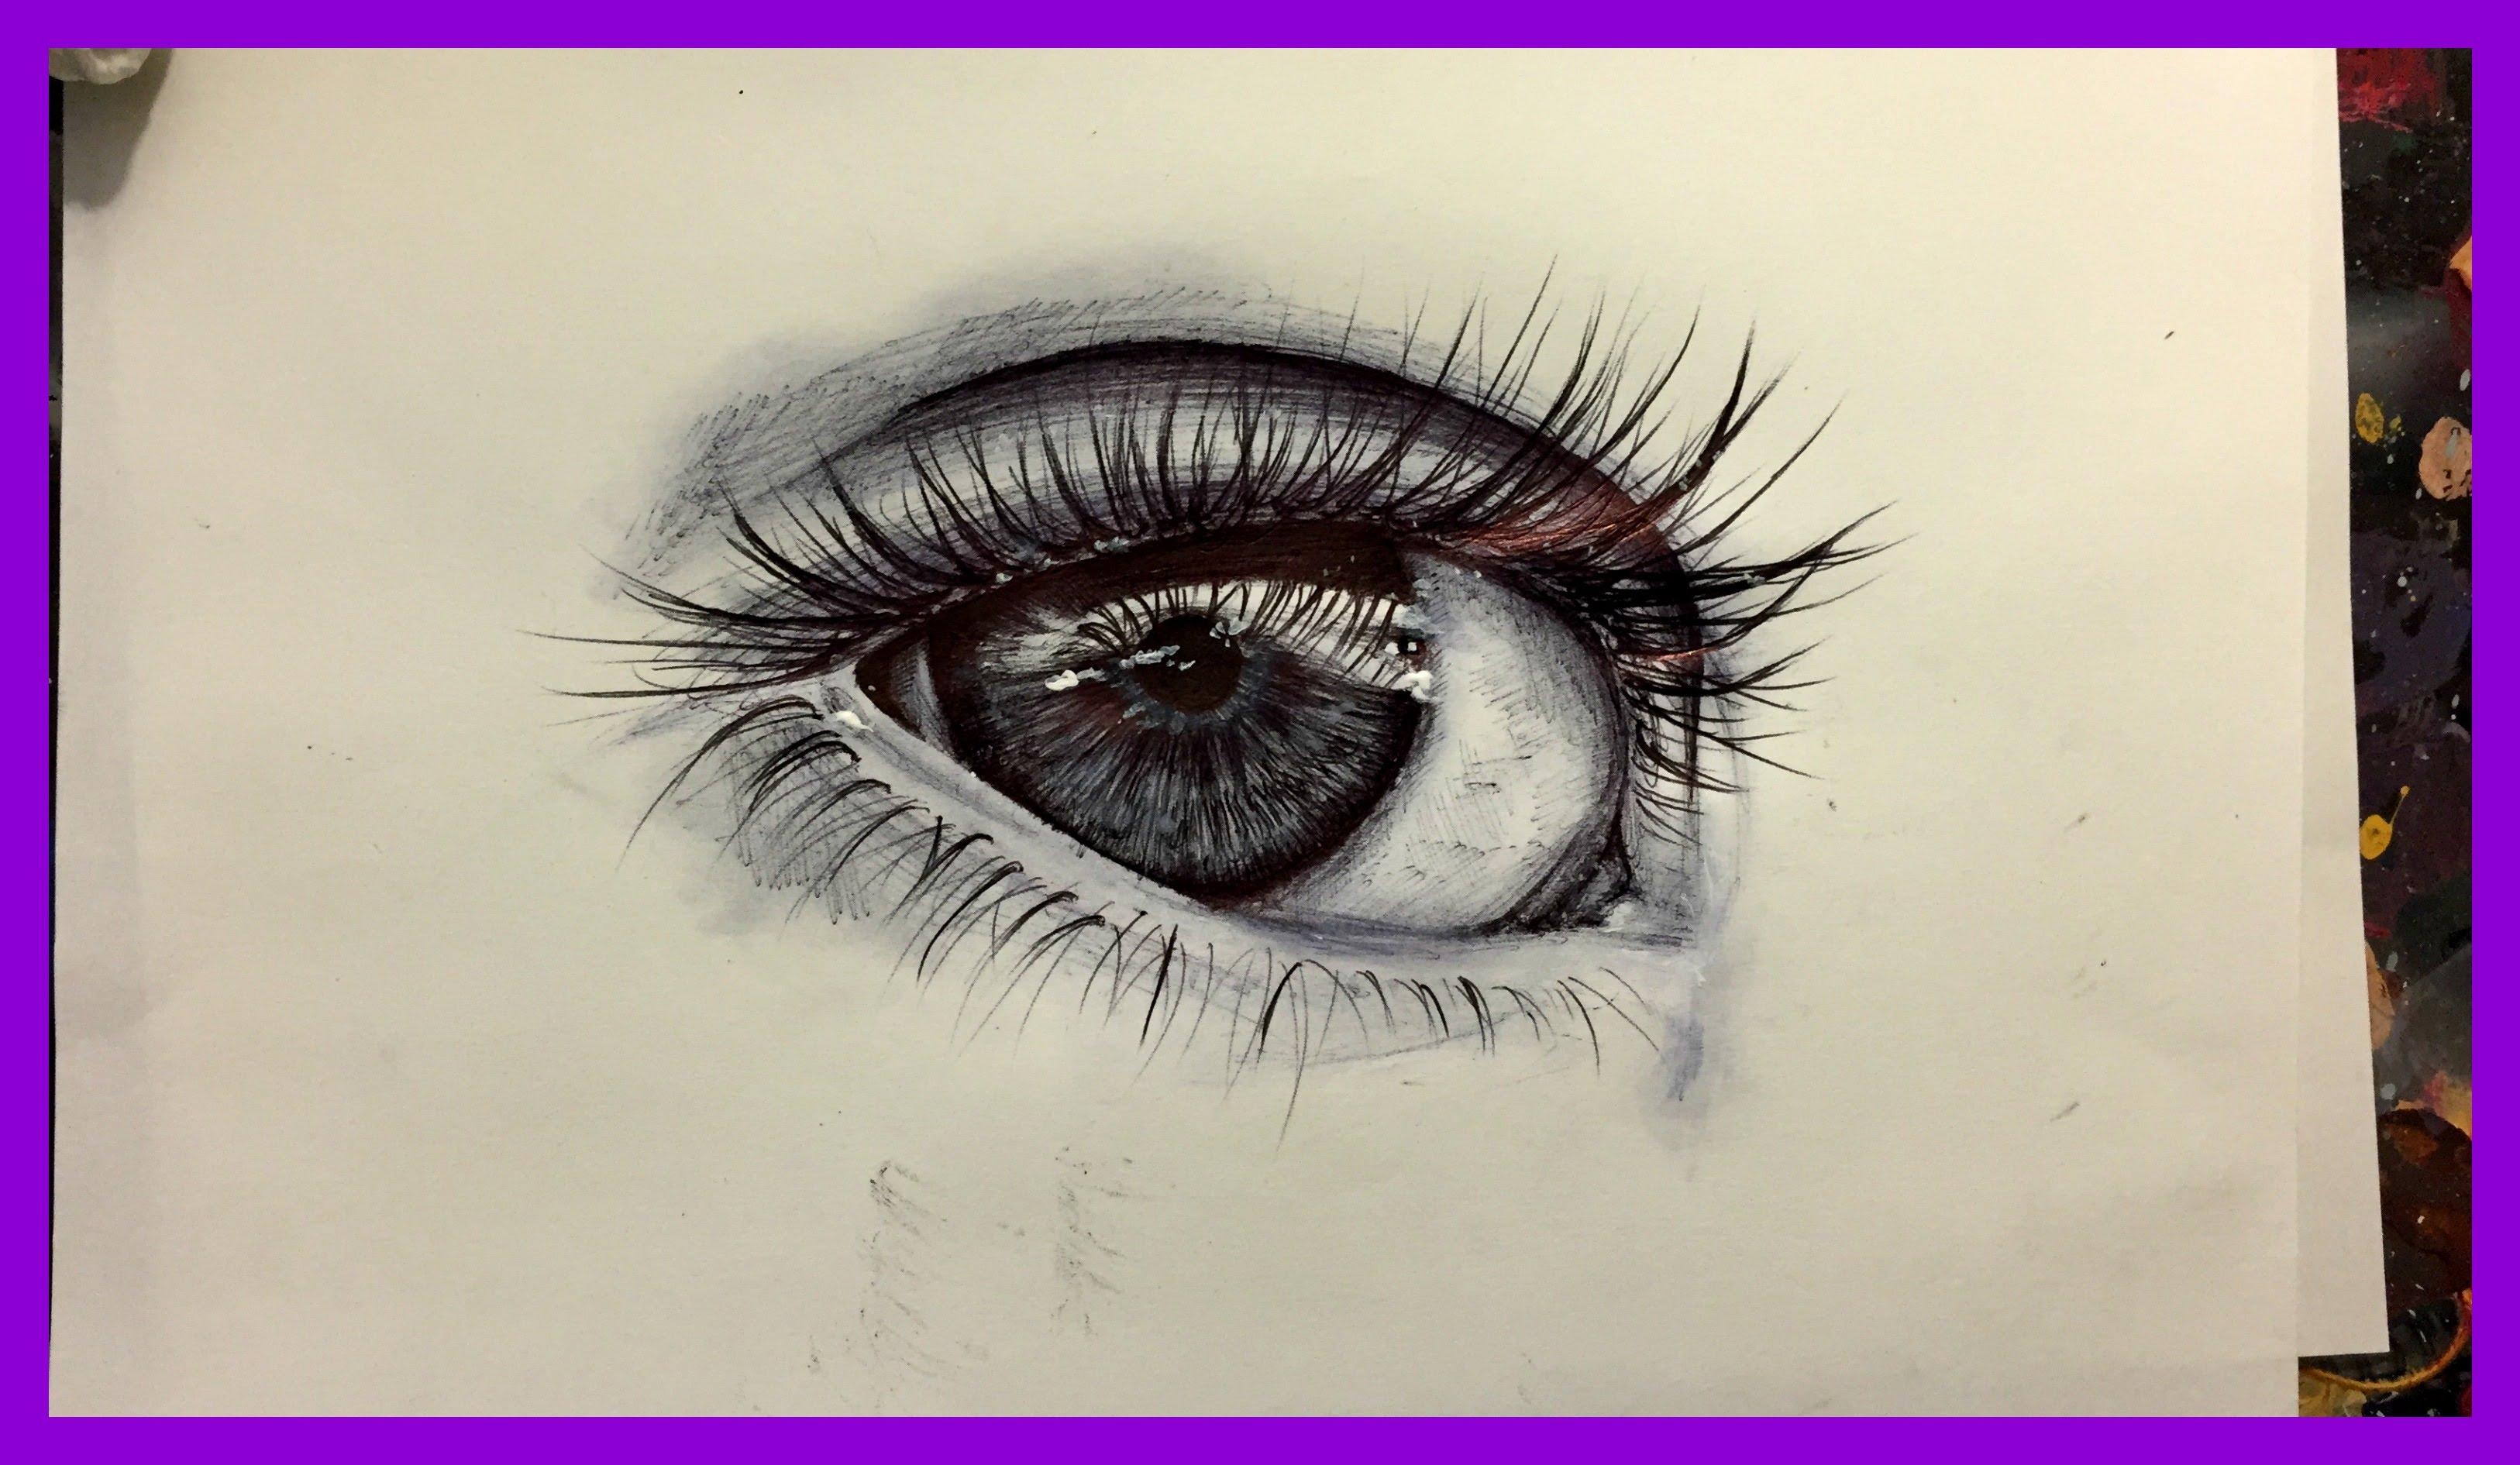 Drawn pen eye REALISTIC TO DRAW EYE DRAW